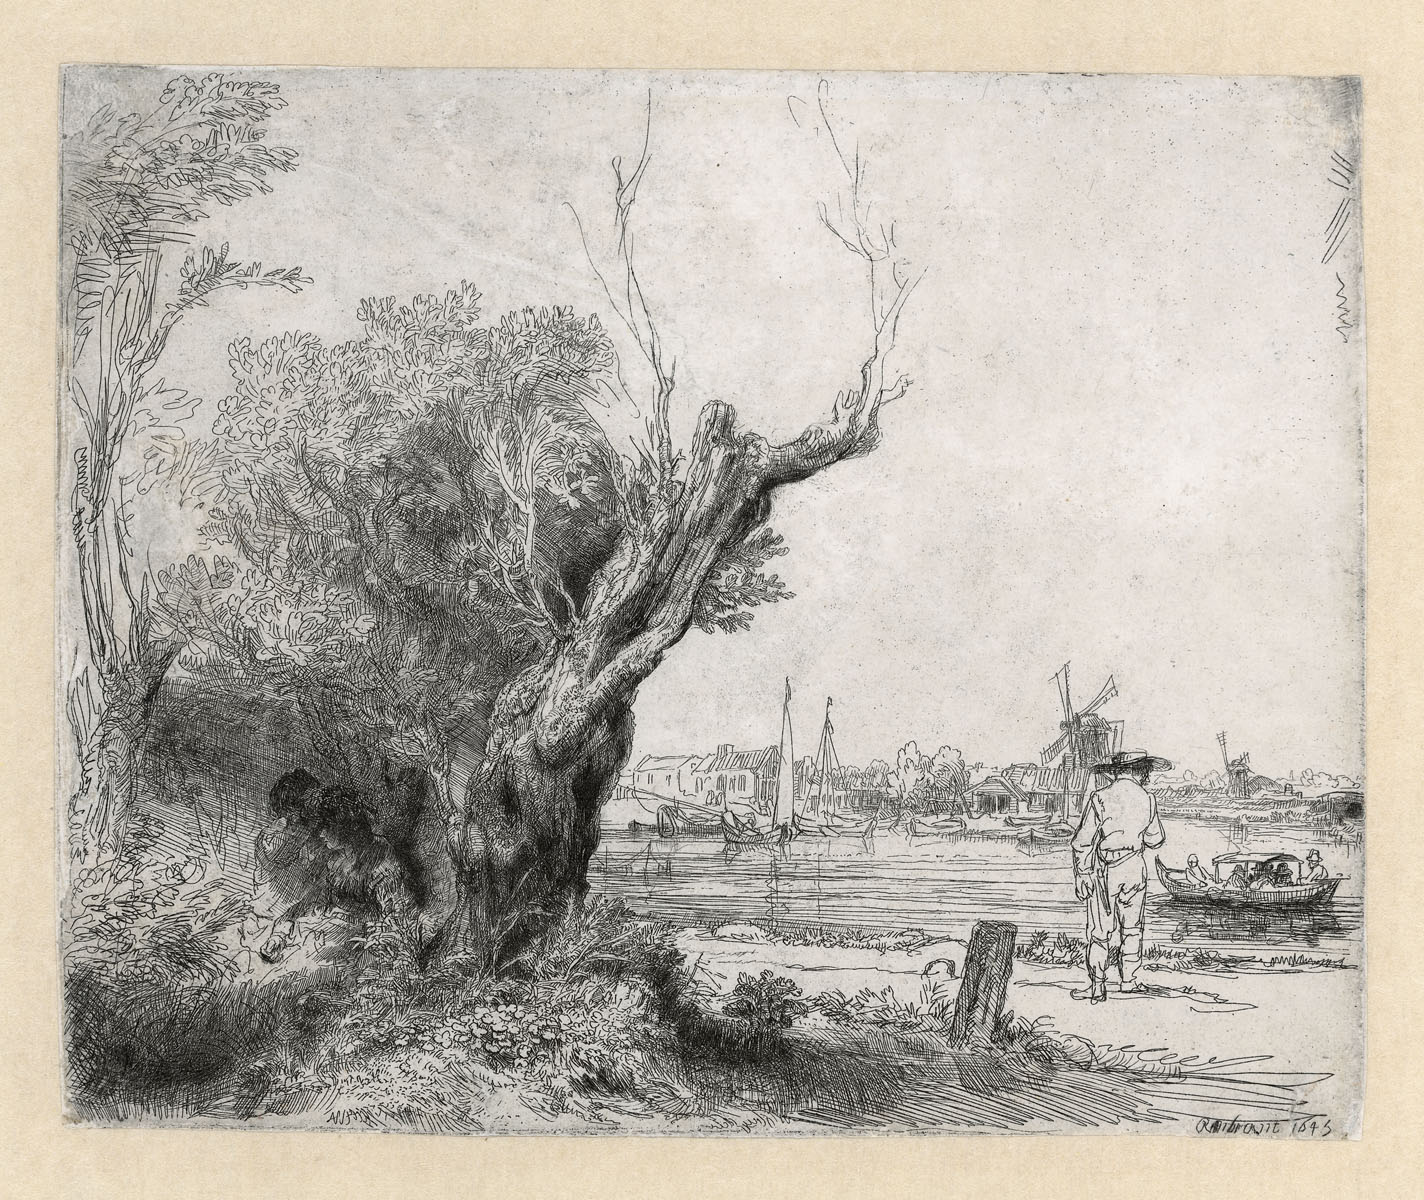 De Omval Rembrandt ets Rembrandthuis Amsterdam